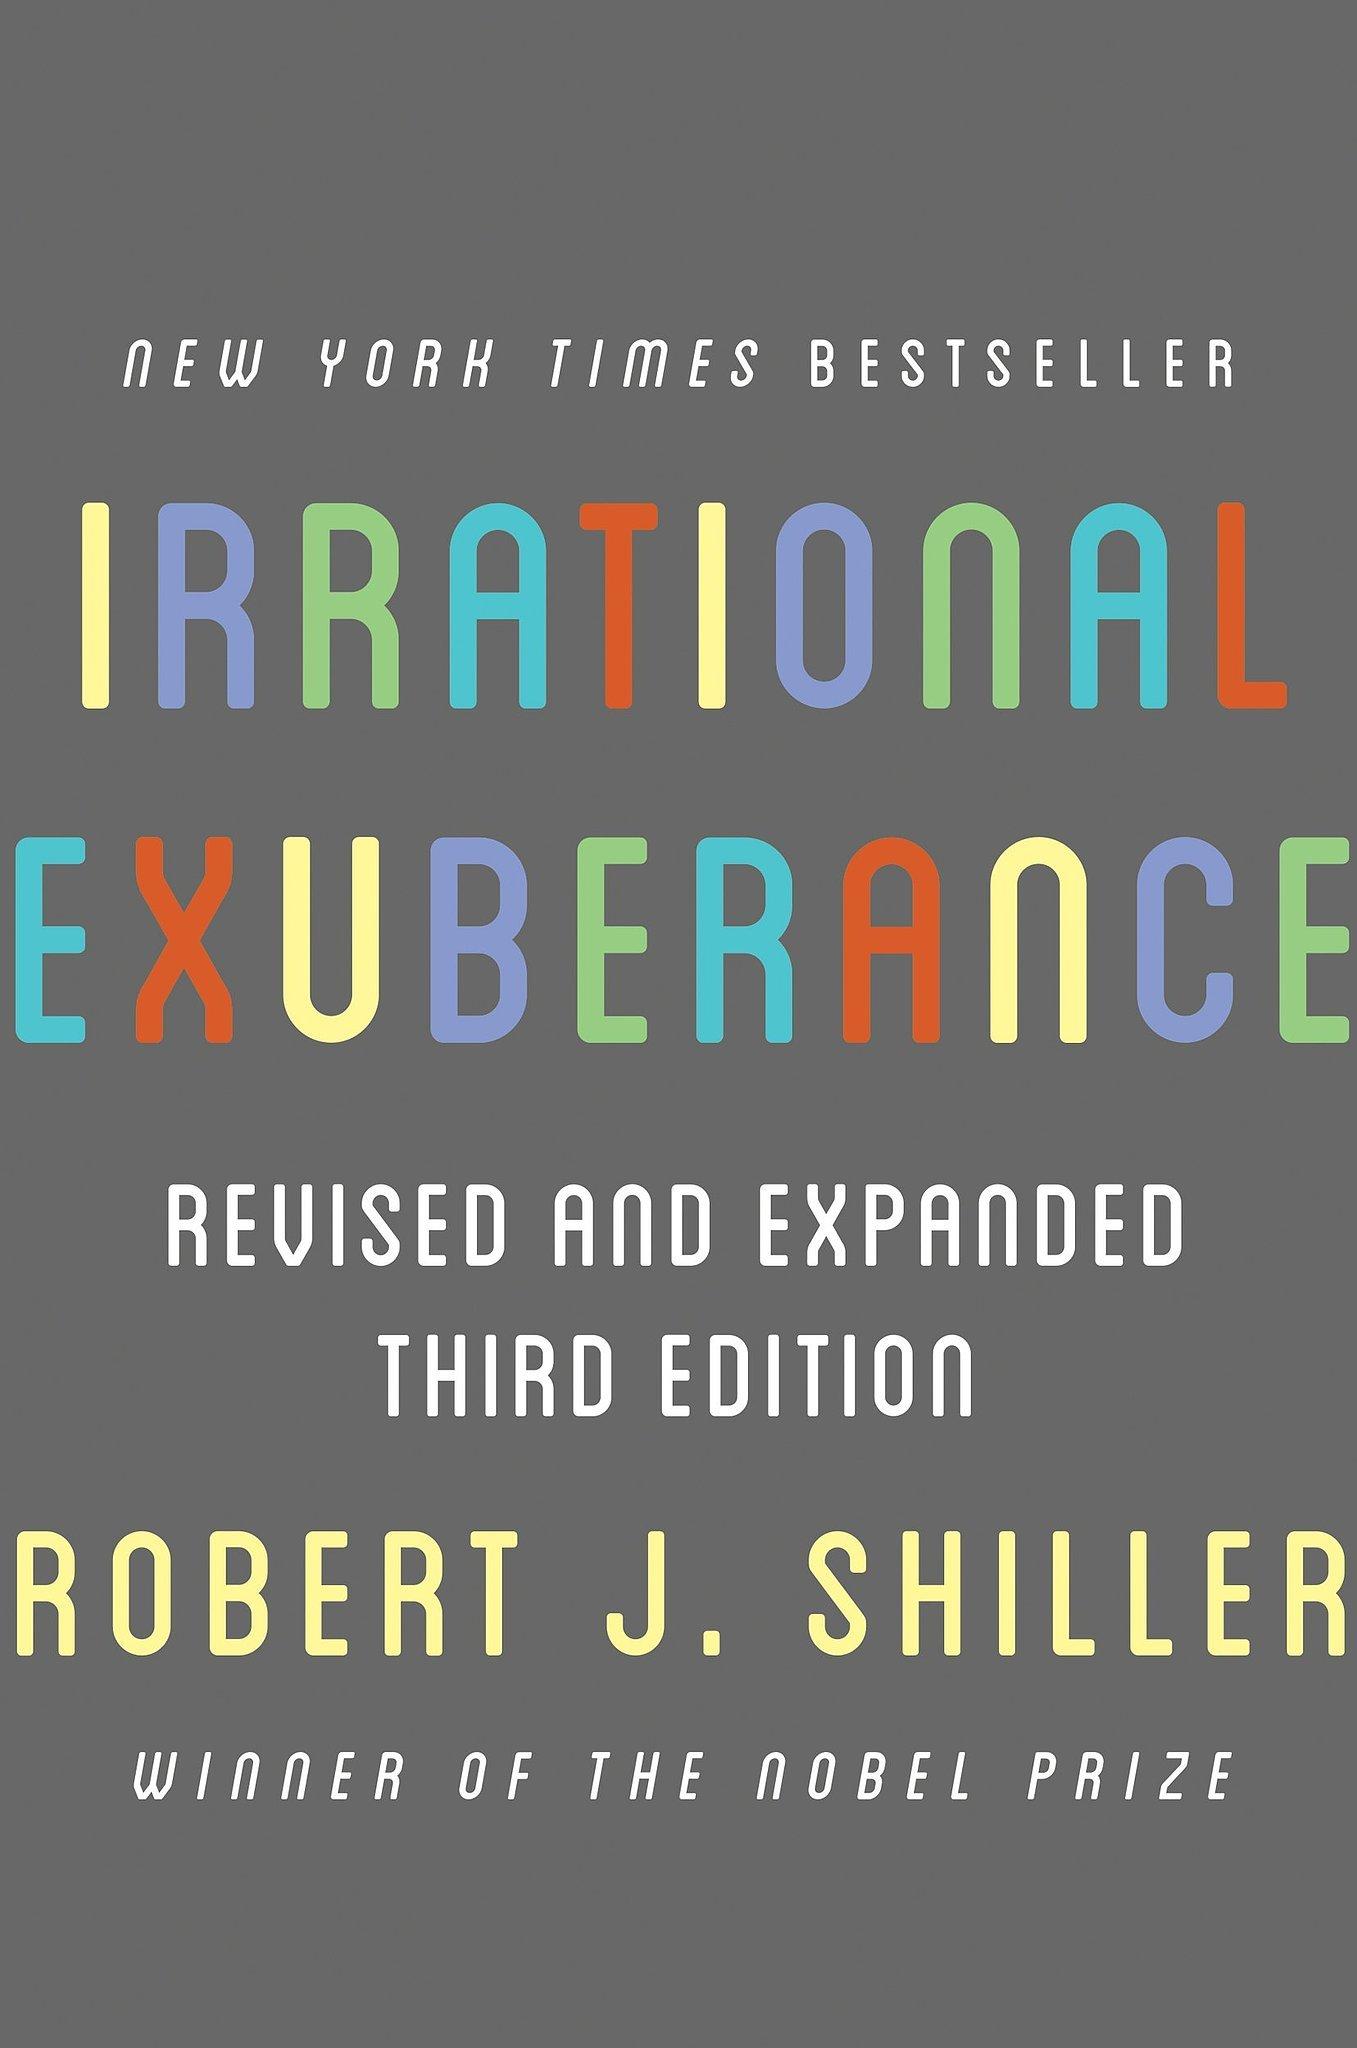 Robert shiller irrational exuberance 2017 : mapoza